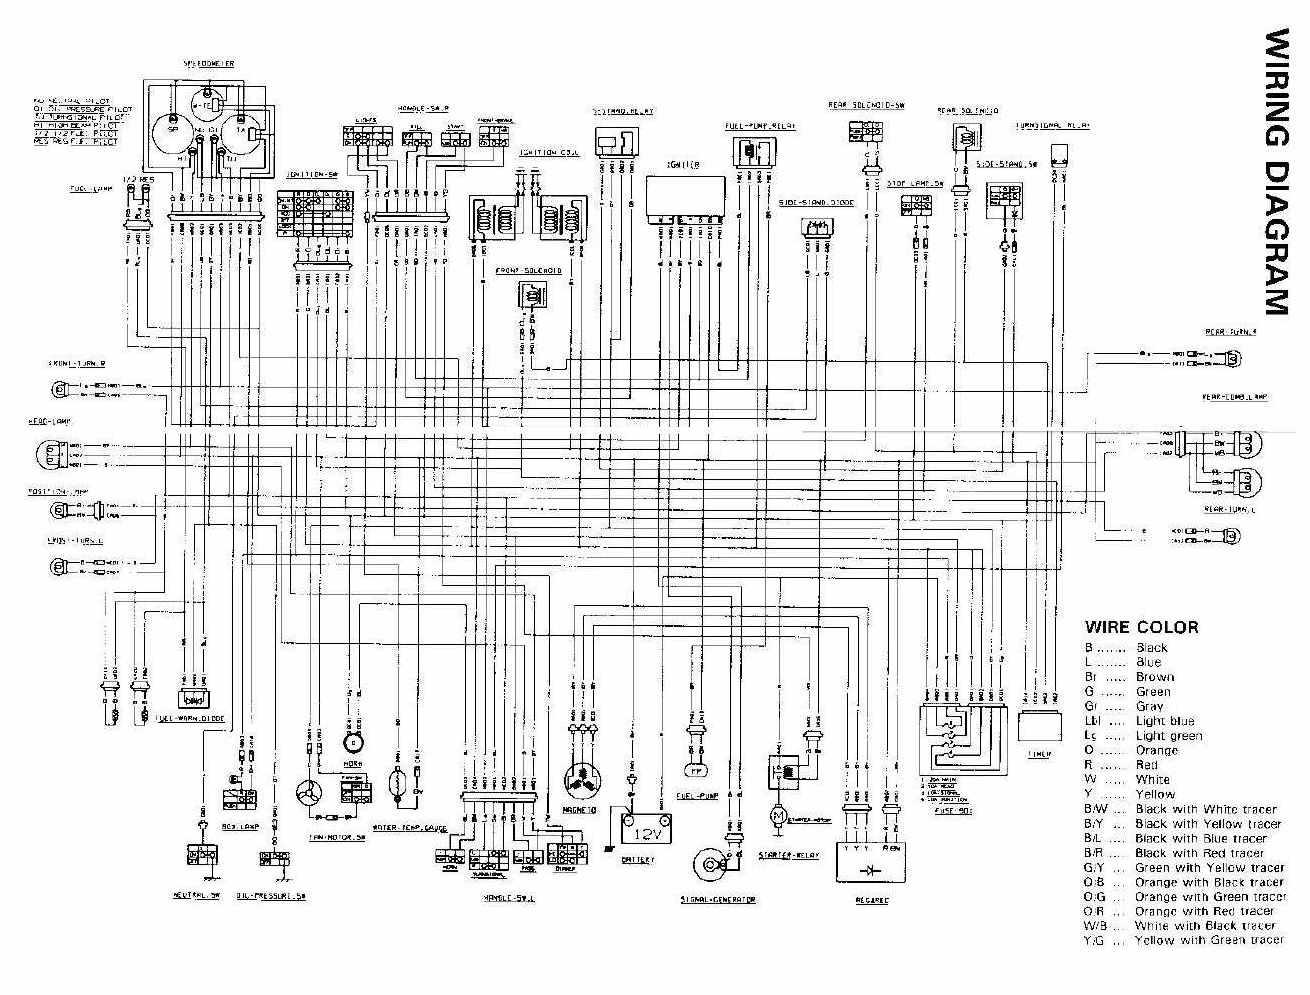 Suzuki 250 Atv Wiring Schematic Diagrams 1993 Harness Trusted Diagram Quads Intruder